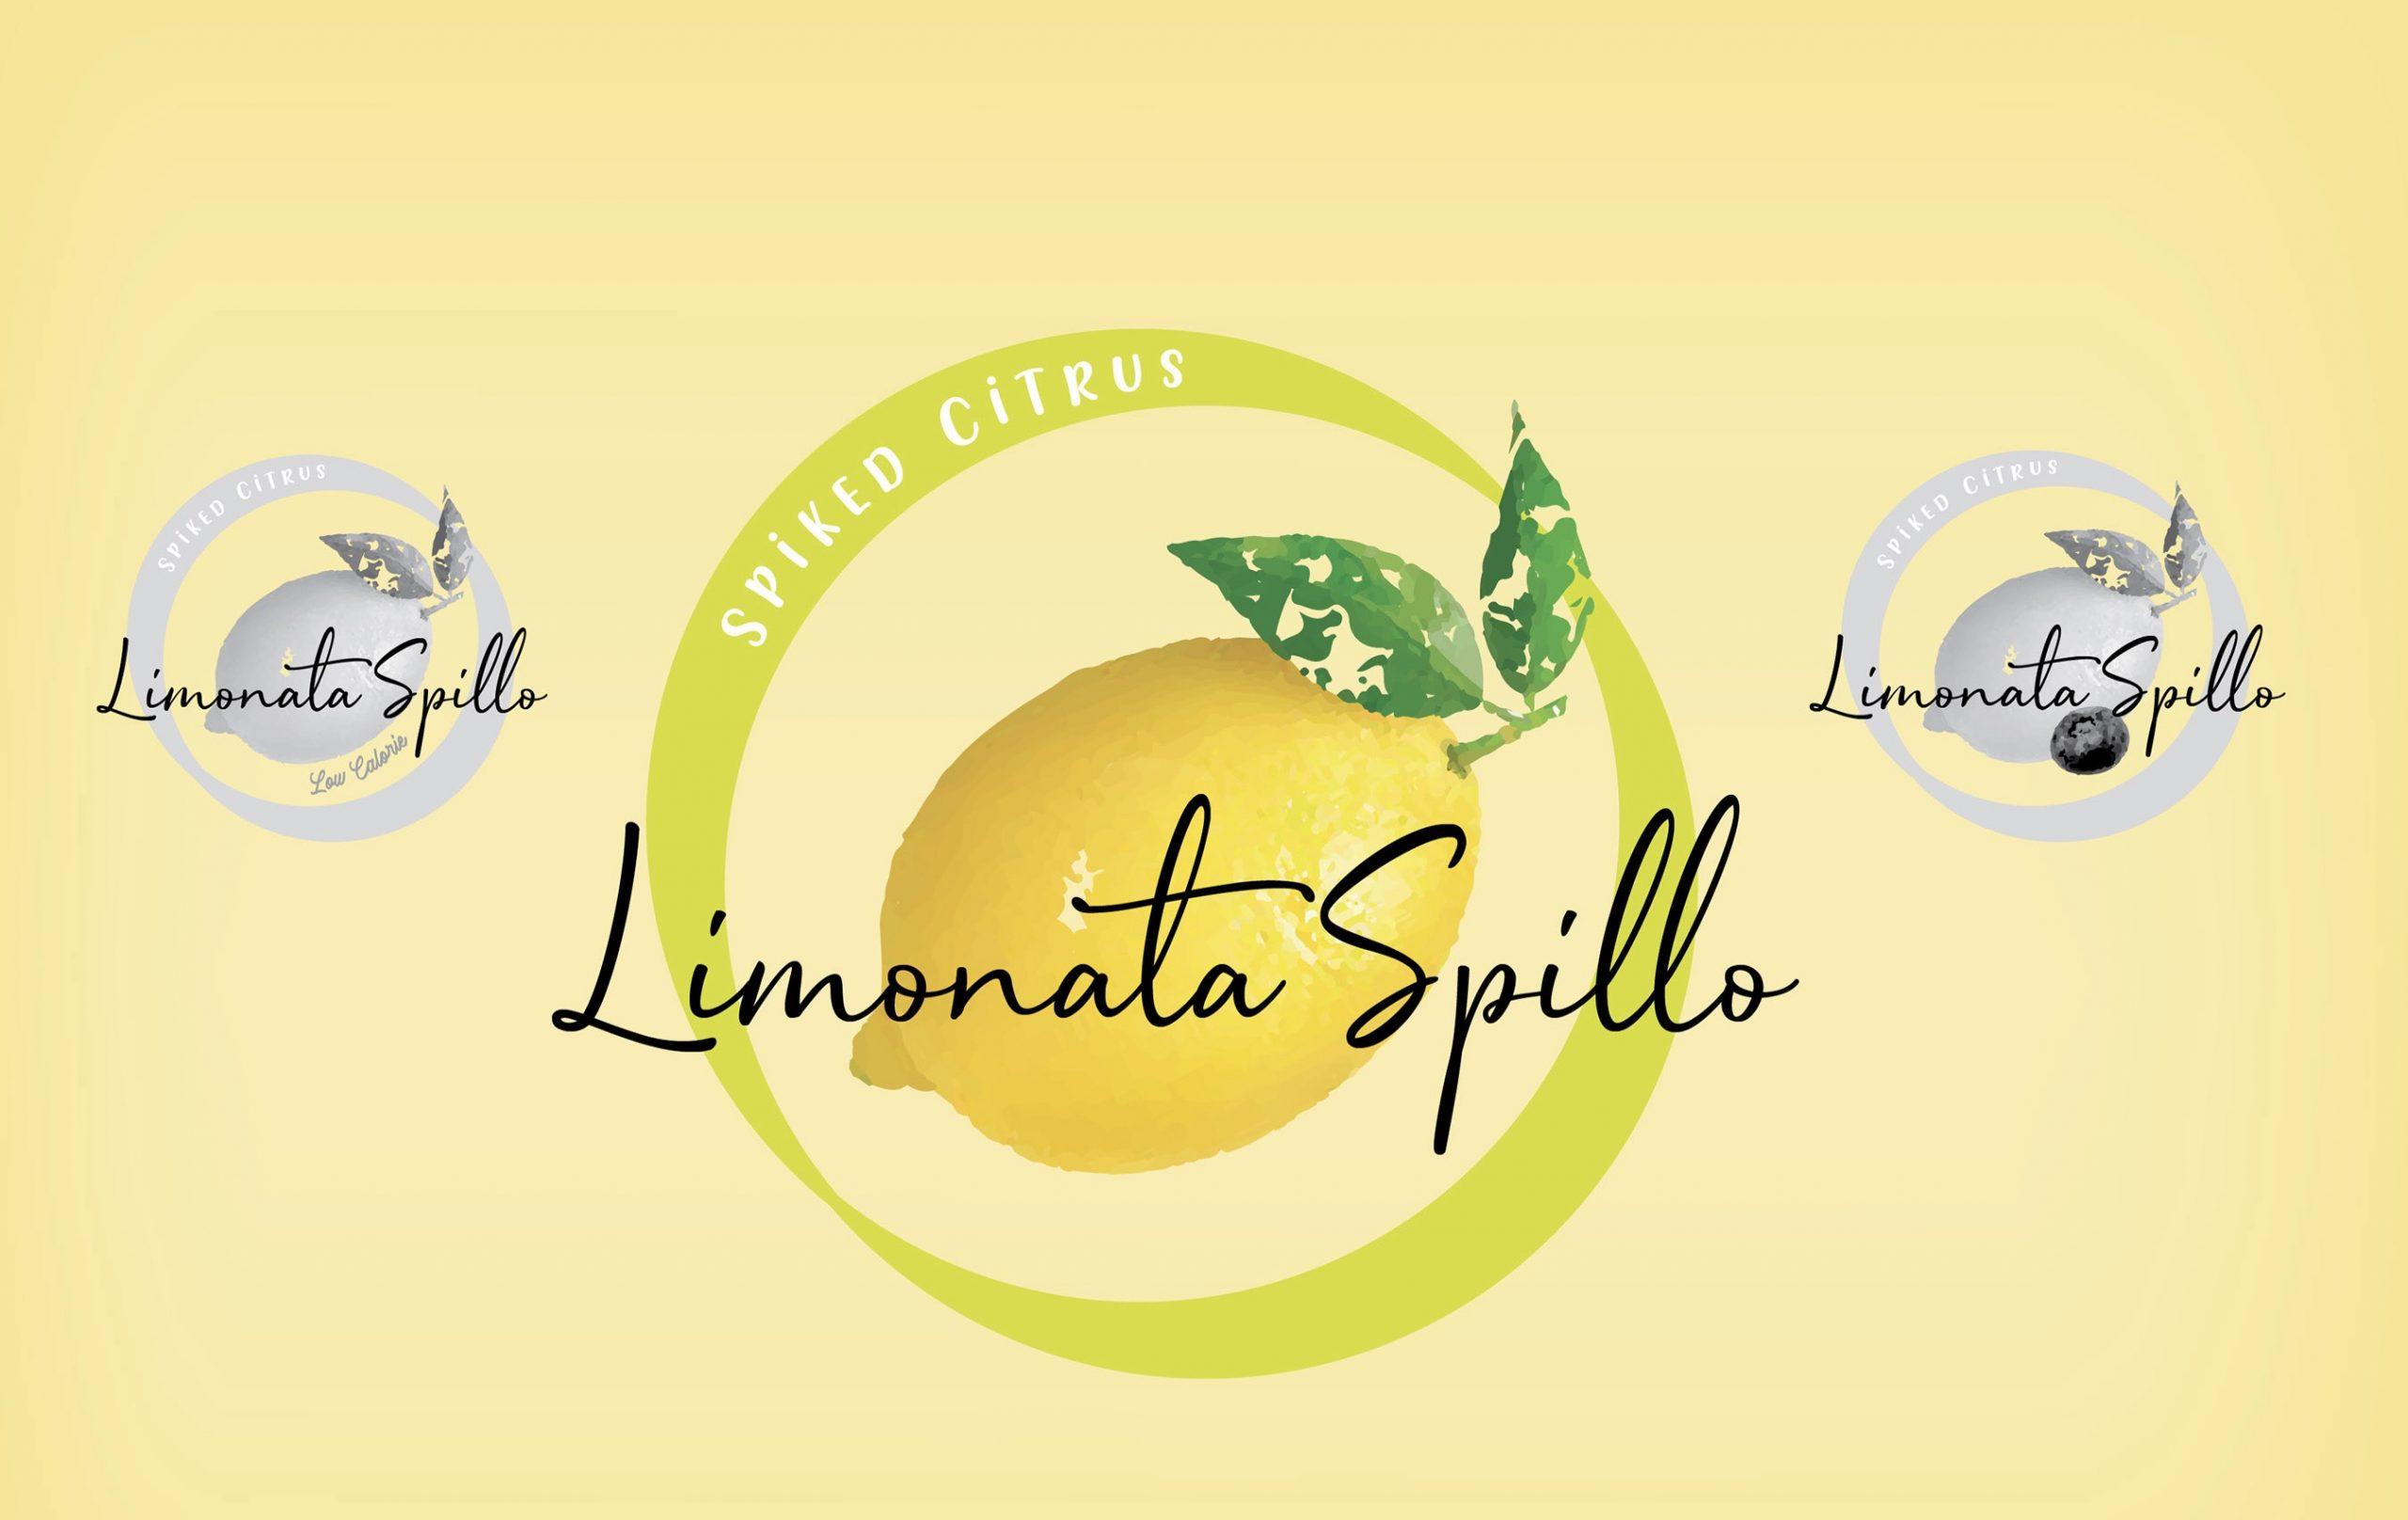 Olayinka Samuel Ogunleye - Limonata Spillo logo (graphic design)